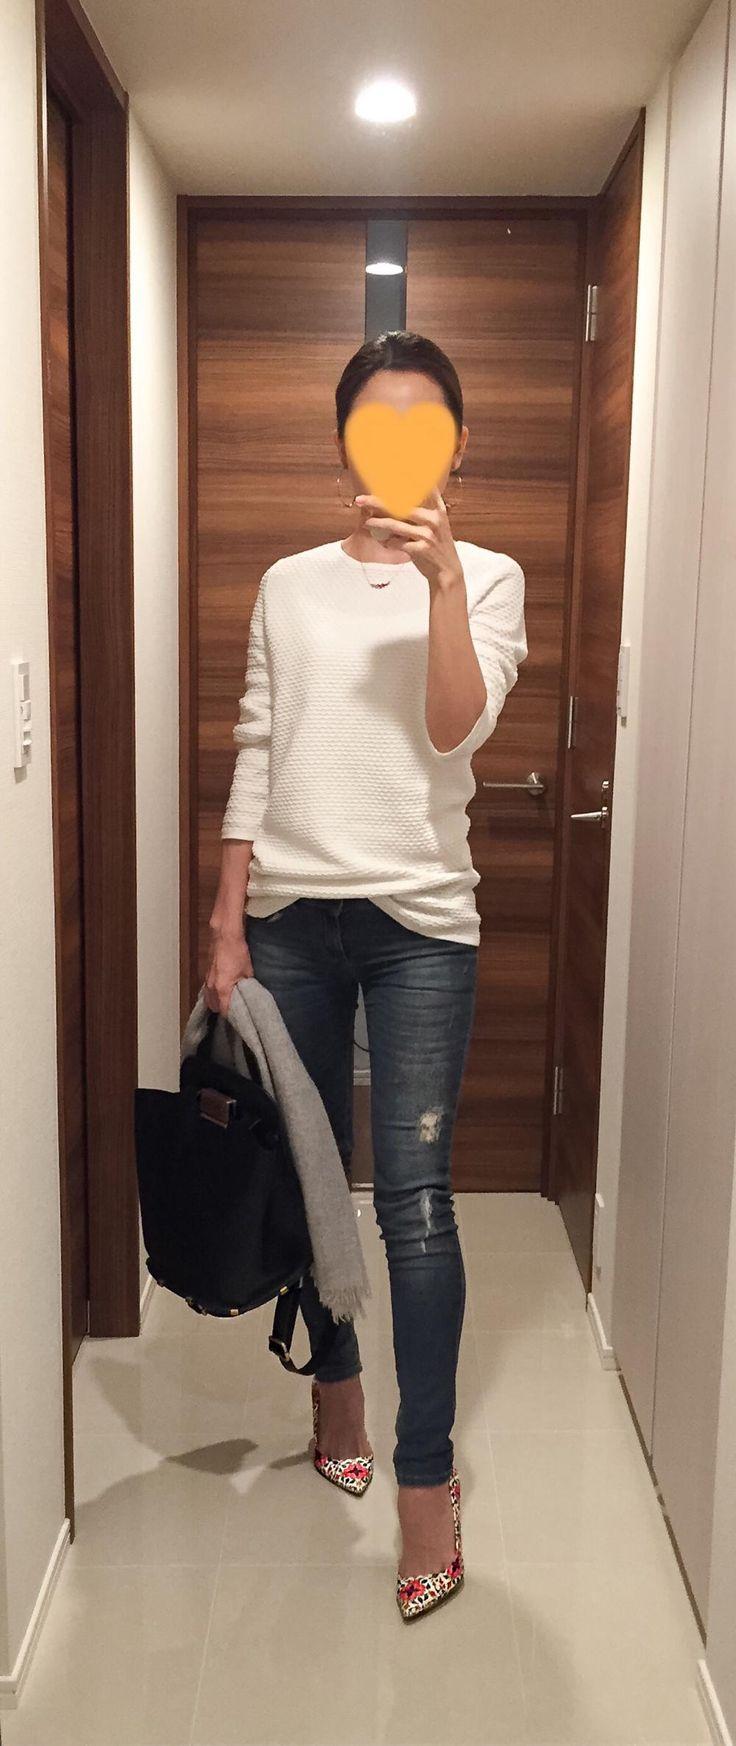 White tops: COS, Skinnies: Sisley, Bag: ZAC Zac Posen, Floral pumps: J. Crew